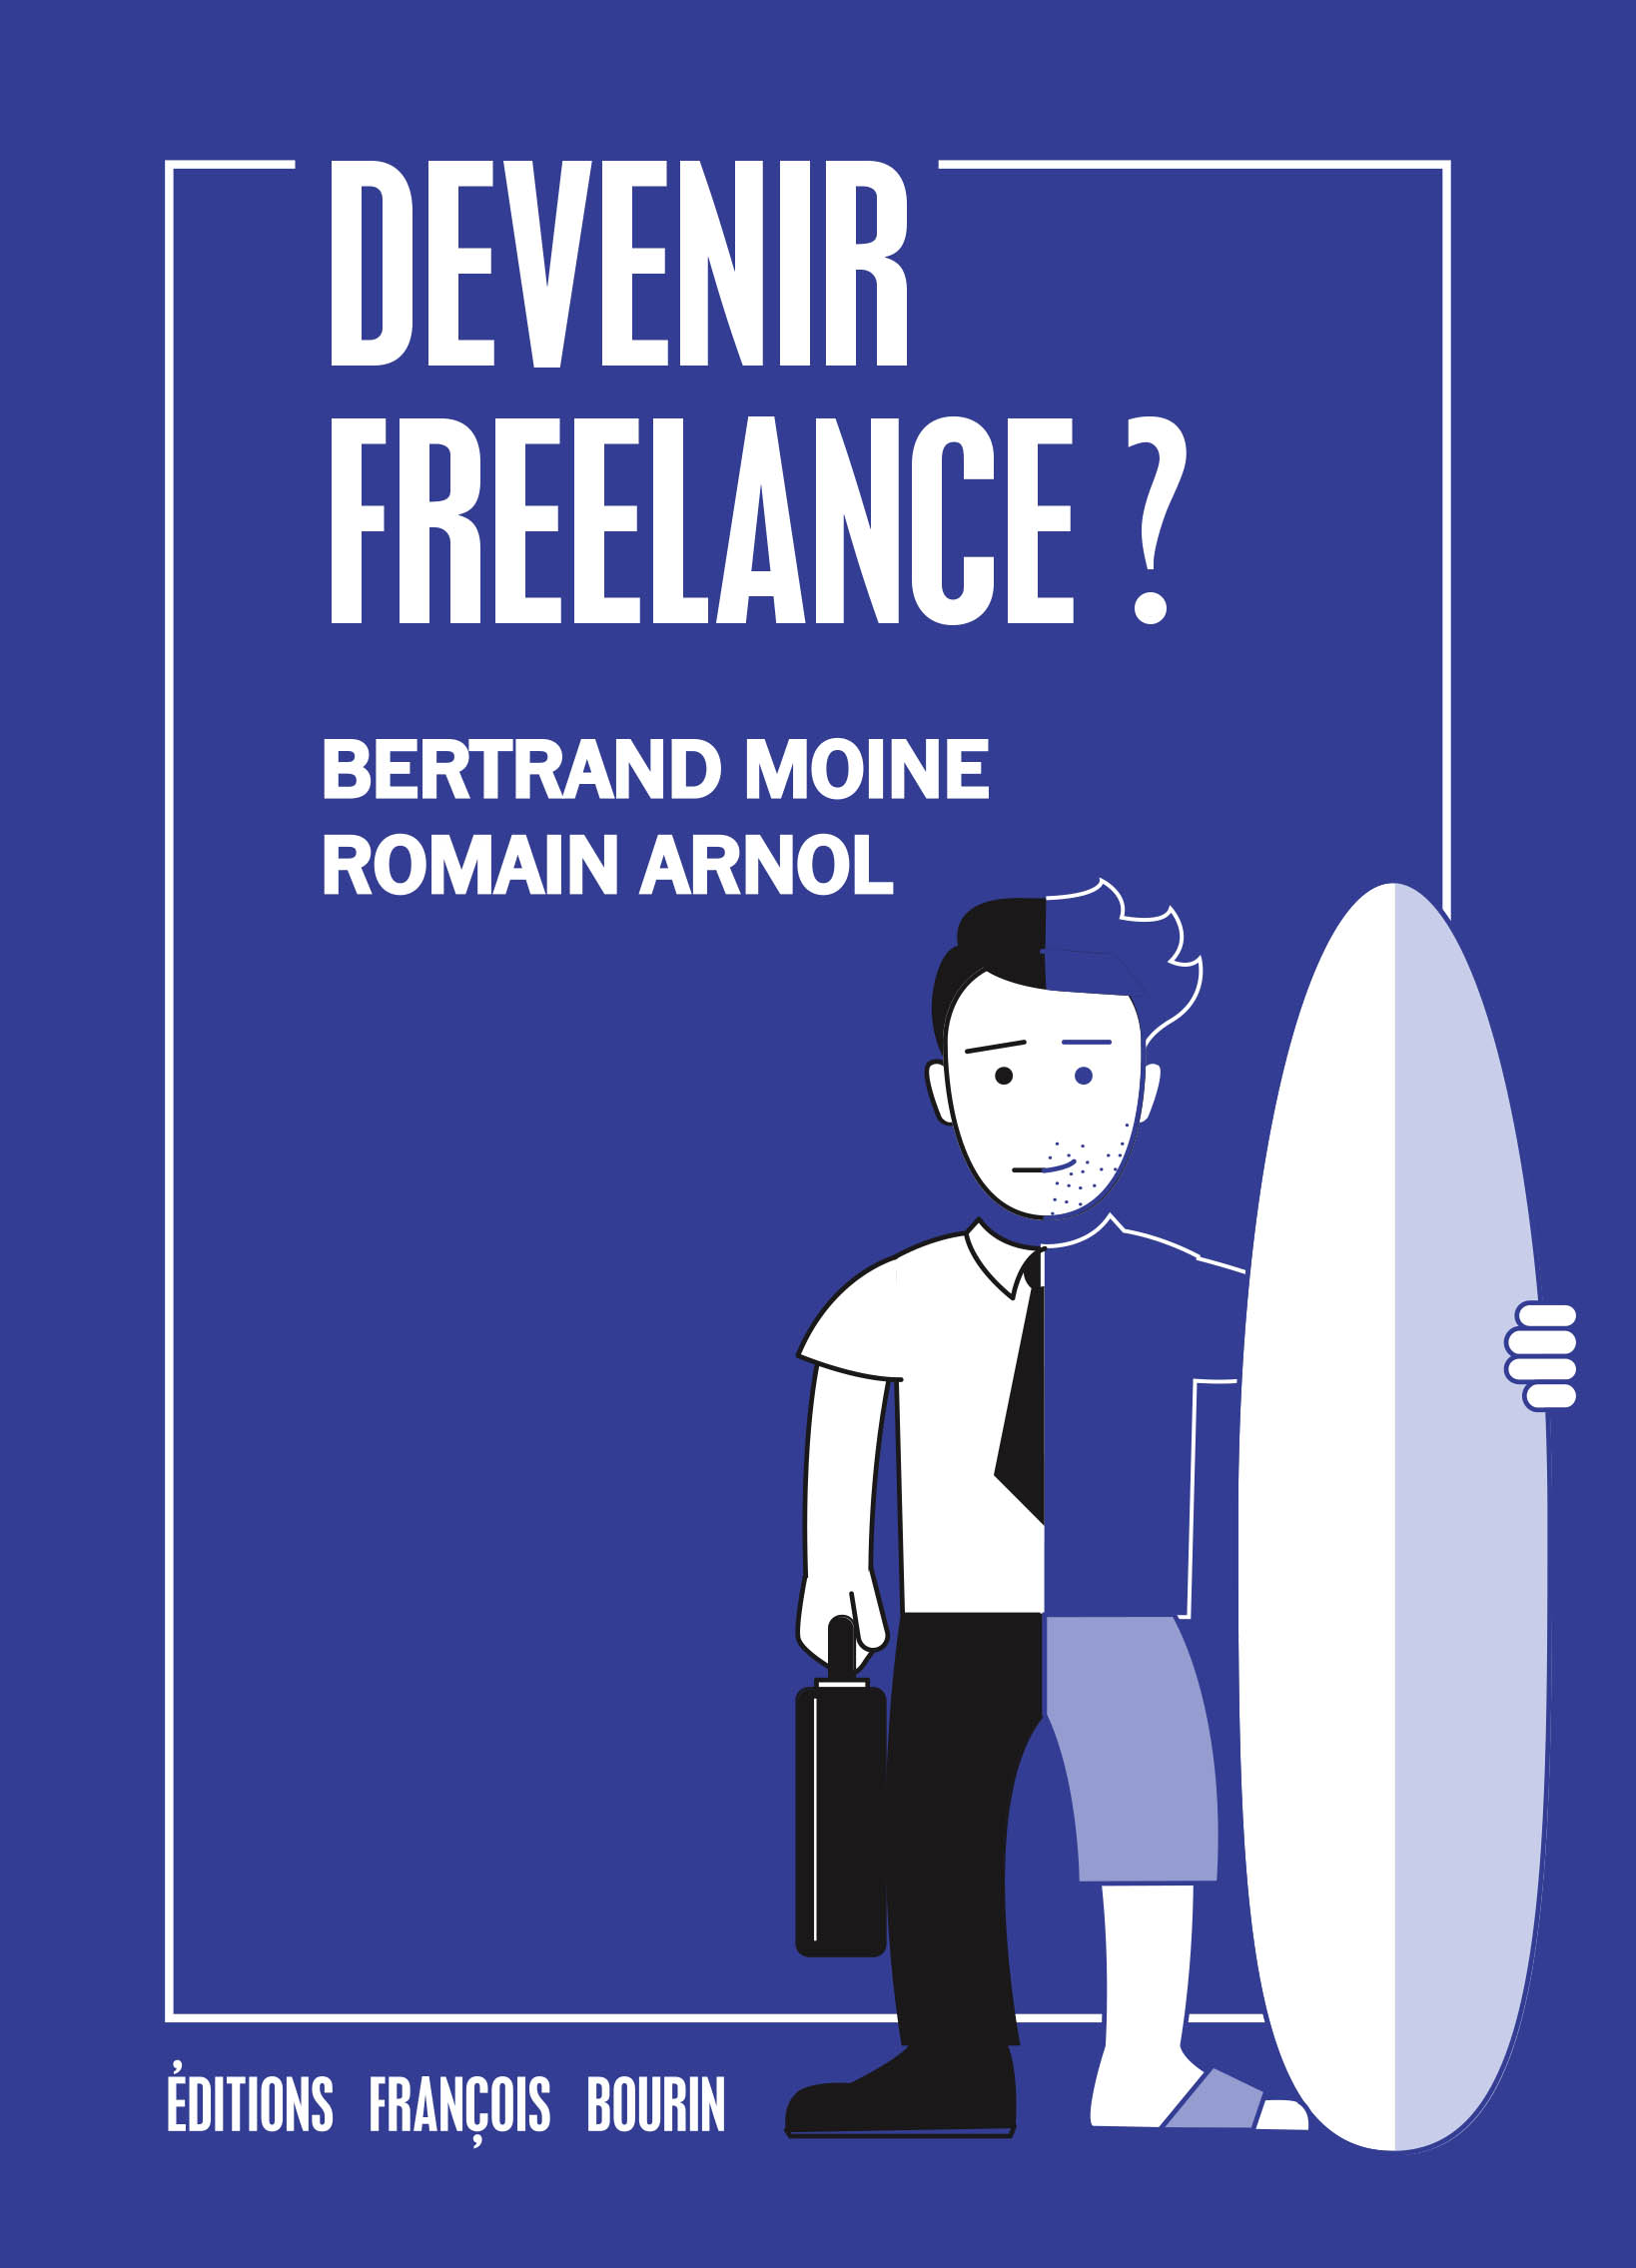 Devenir freelance ?